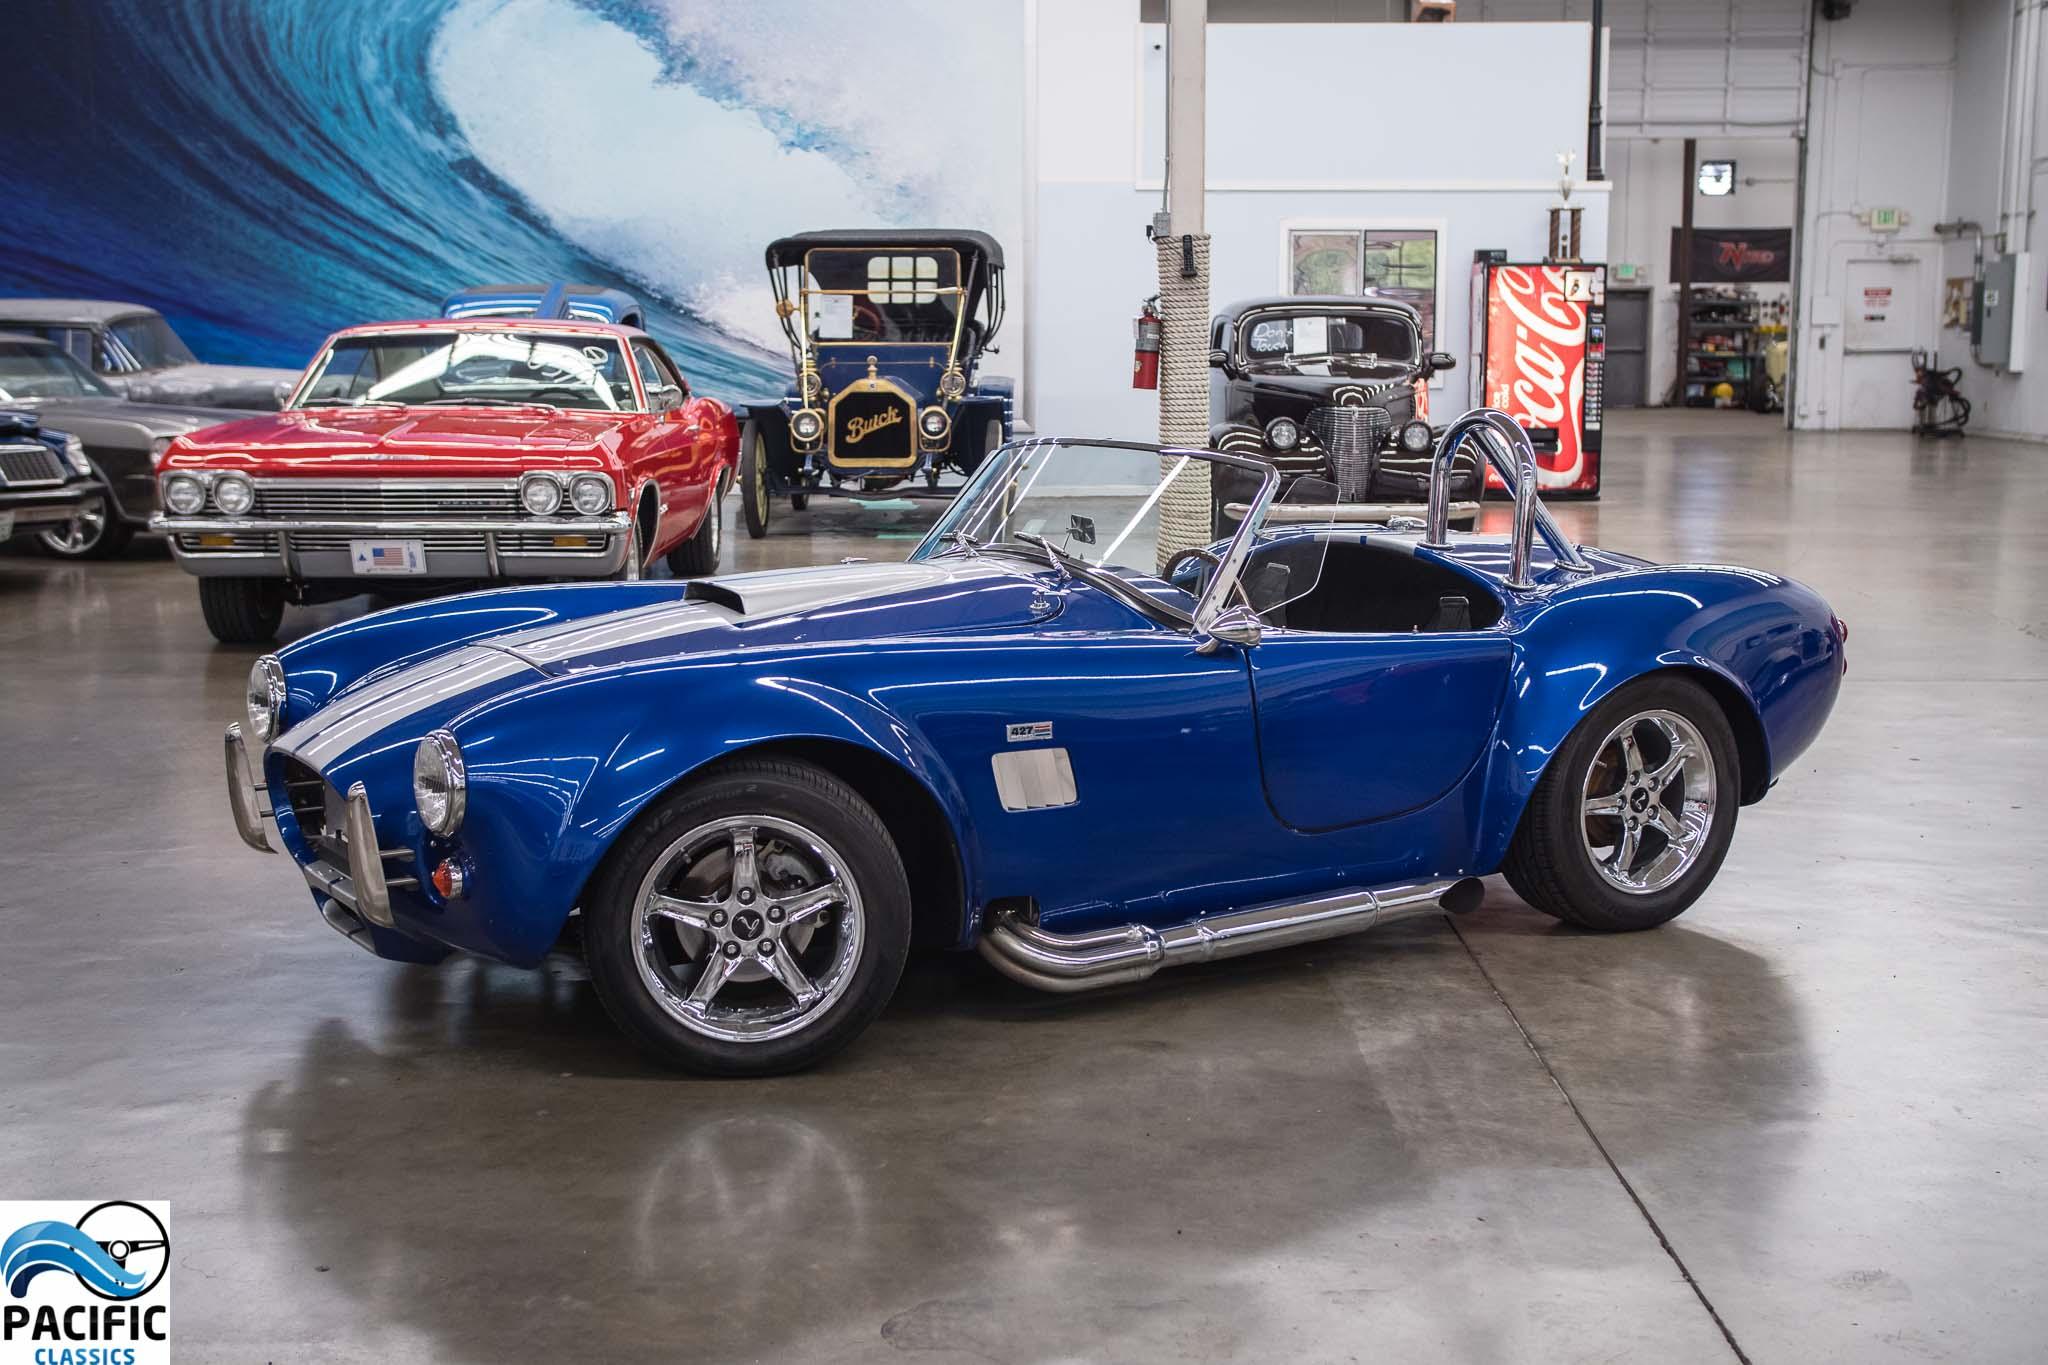 2001 Factory Five Cobra Replica